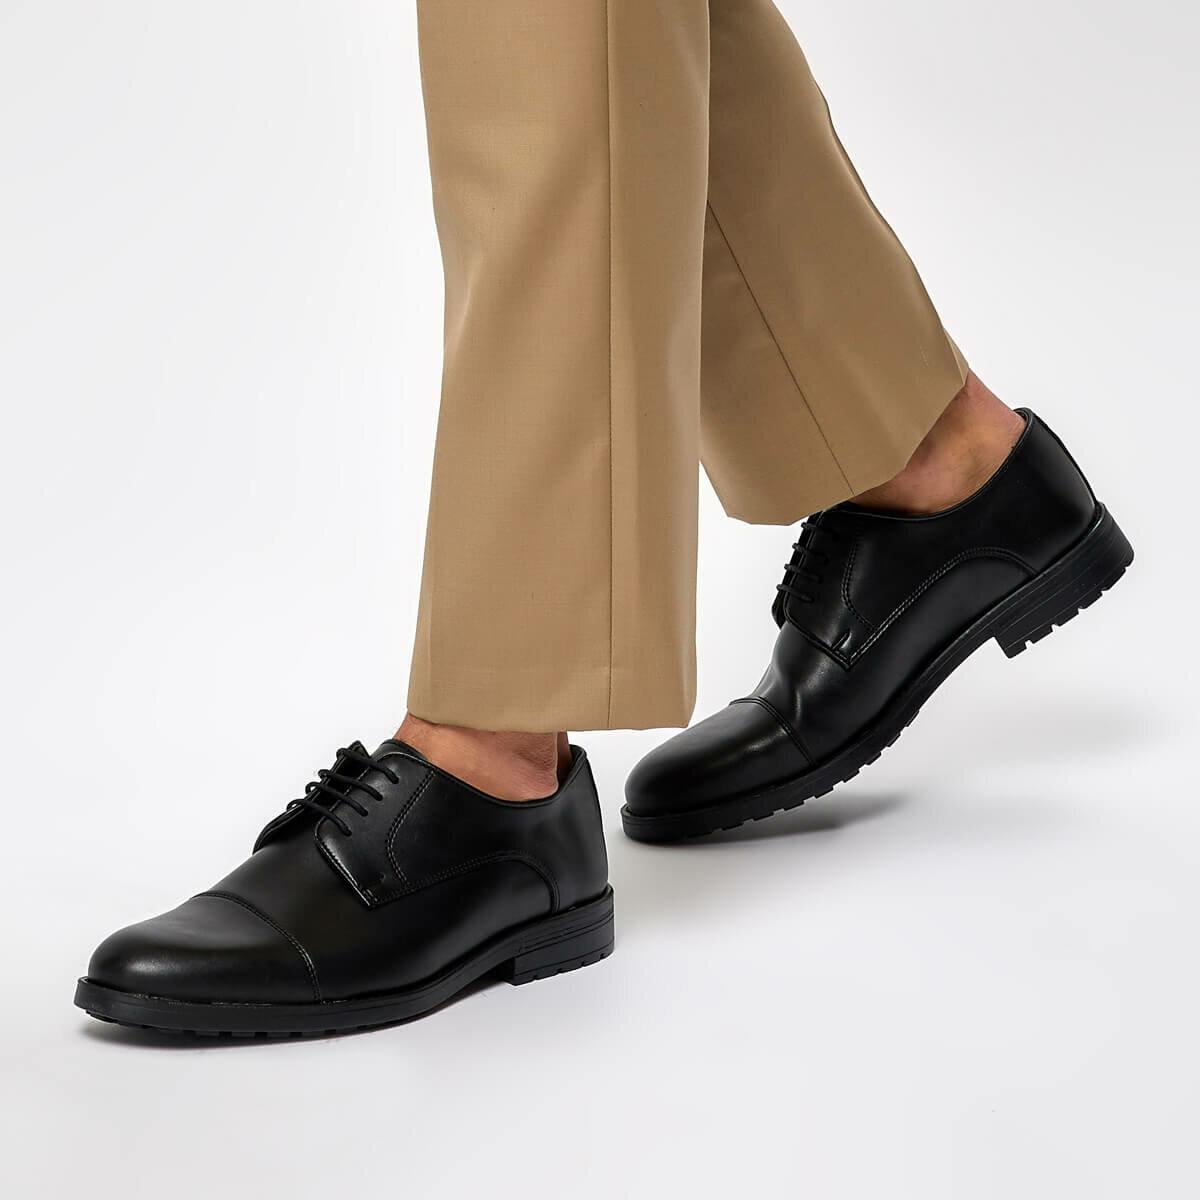 FLO 204-5 Black Men 'S Classic Shoes JJ-Stiller